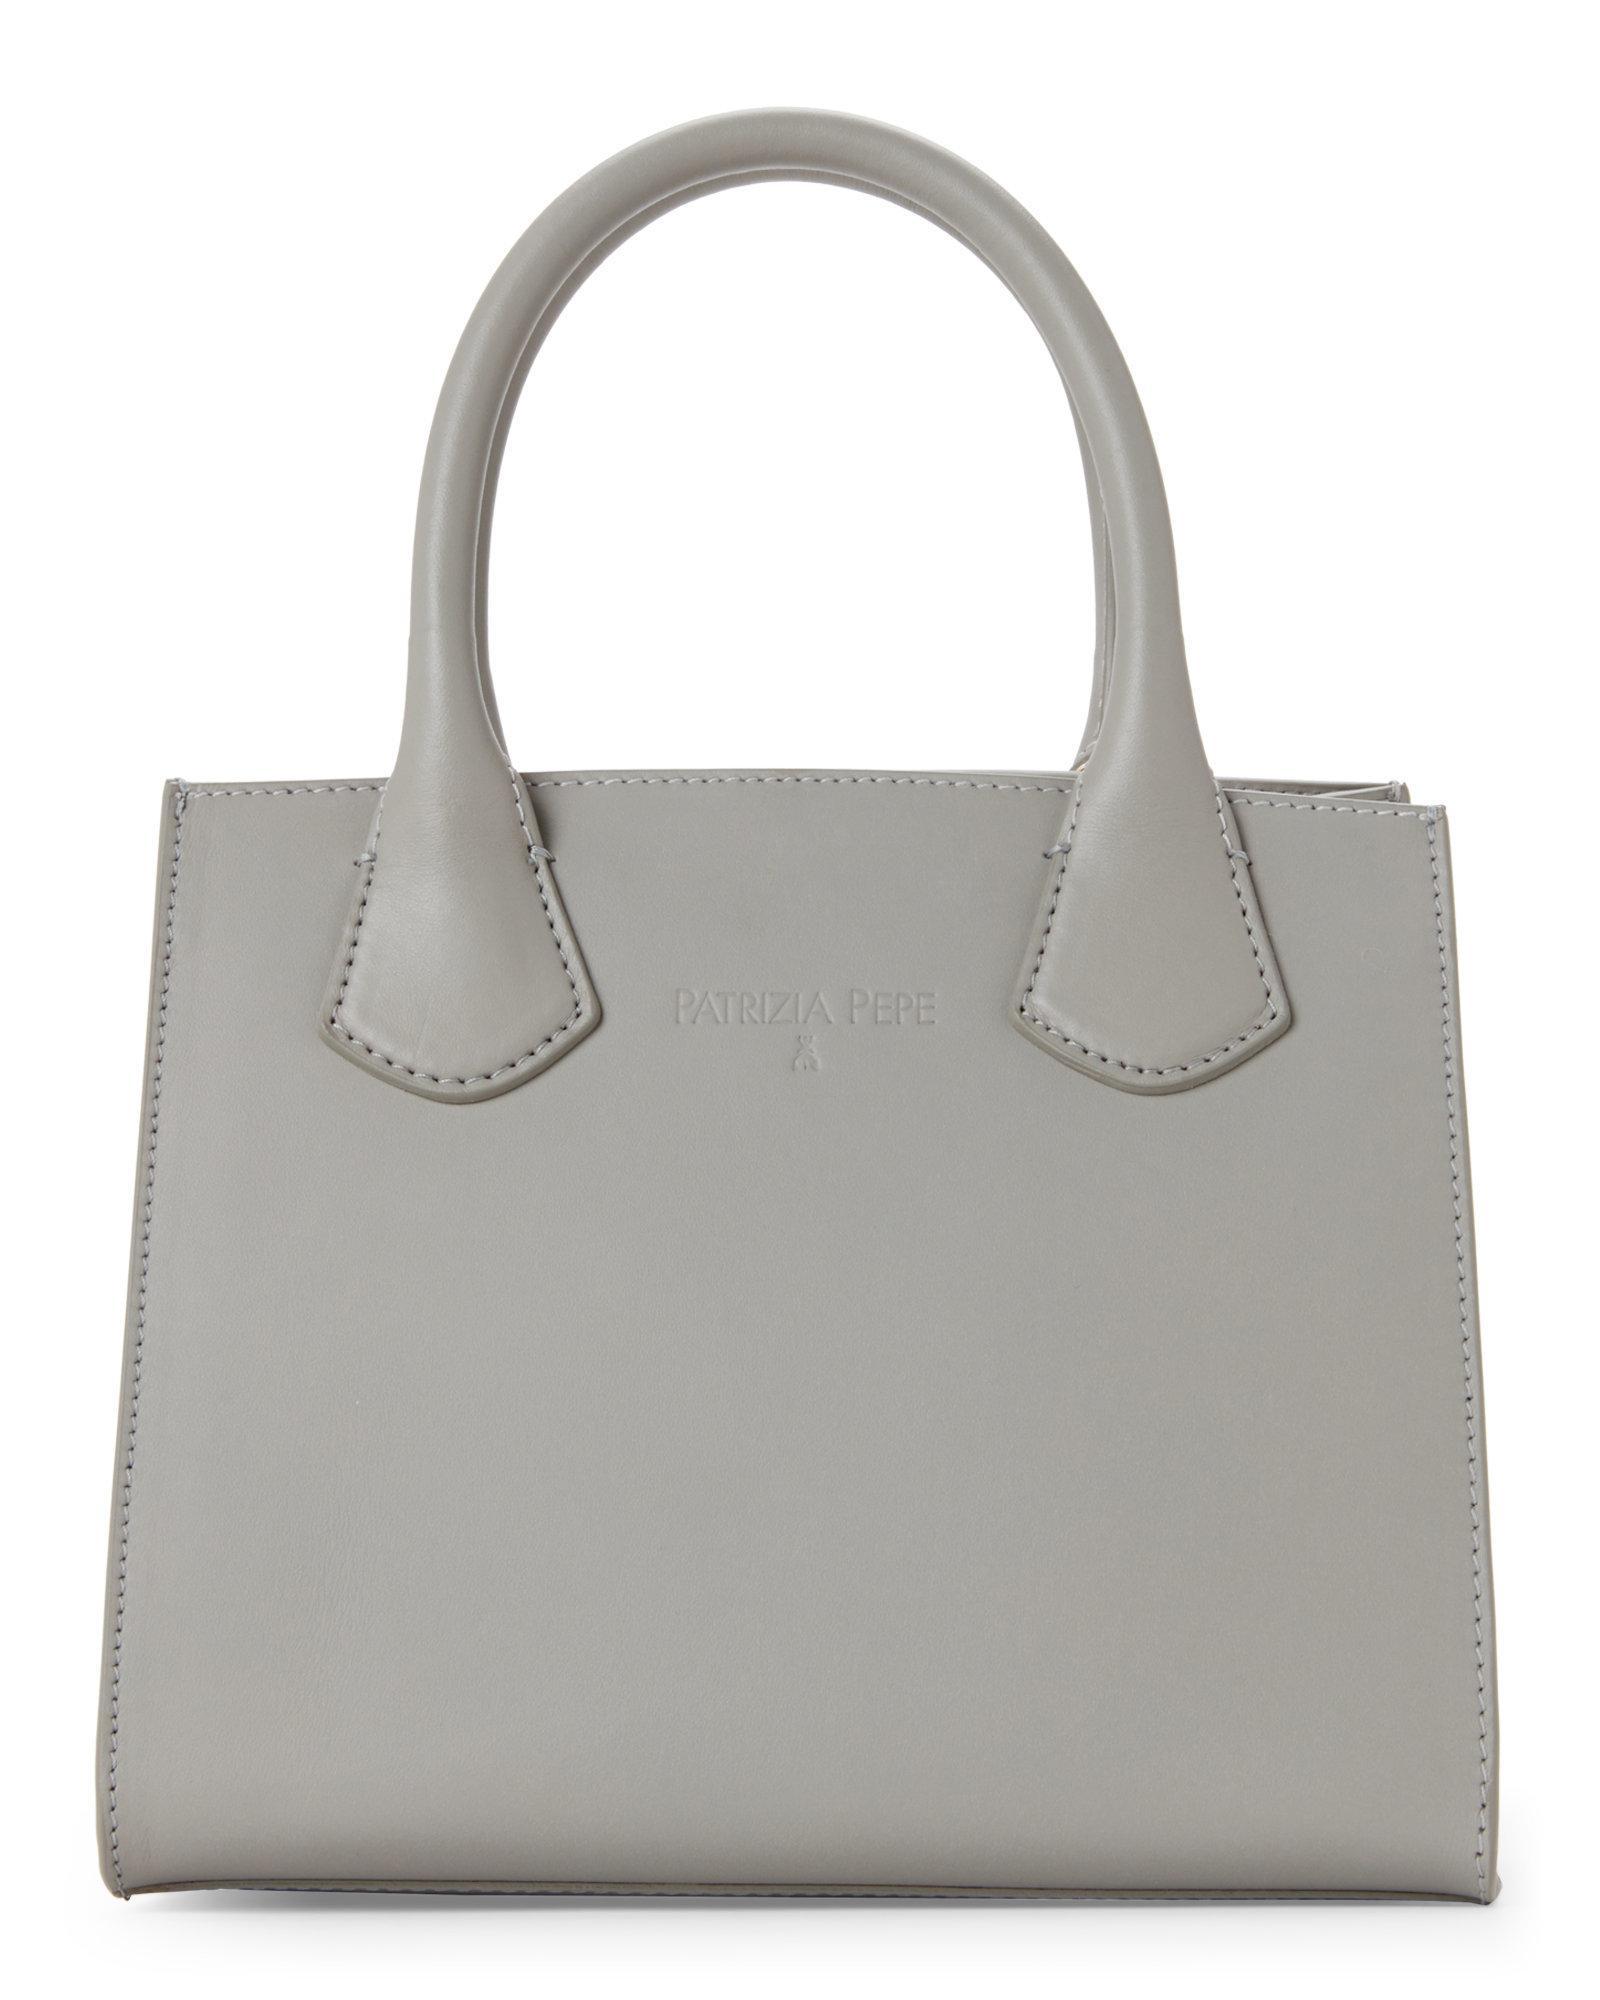 d2f21bd31b Patrizia Pepe Warm Grey Mini Leather Satchel in Gray - Lyst